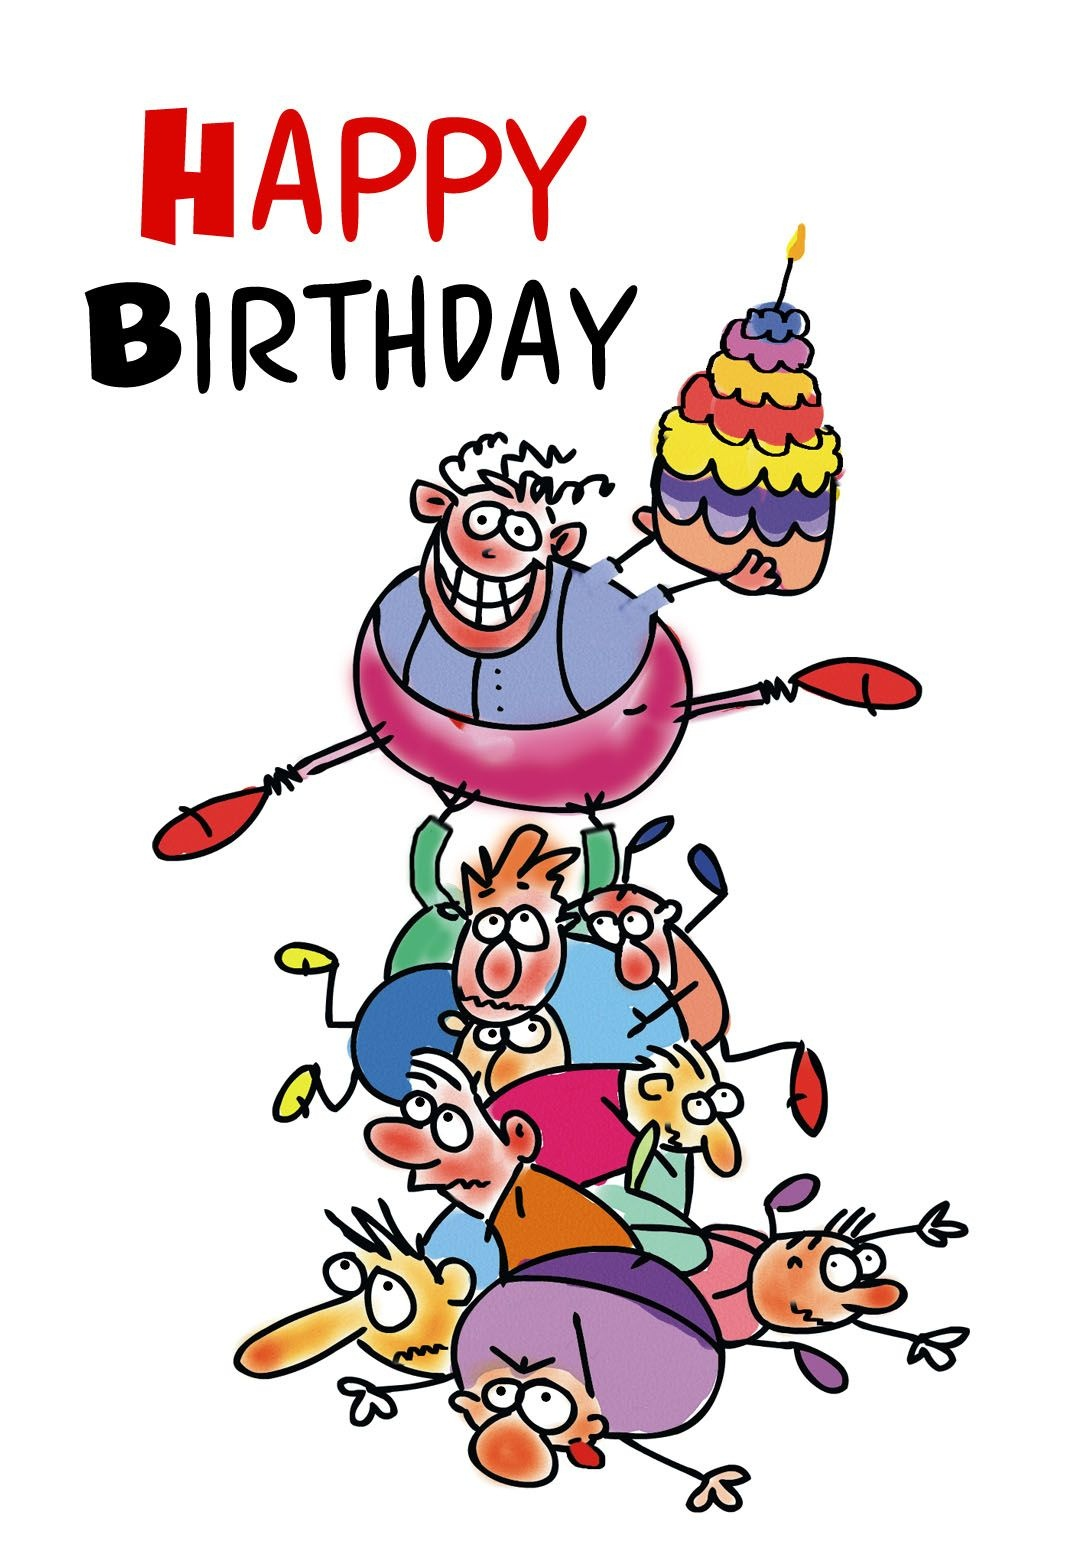 Free Printable Funny Birthday Greeting Card | Gifts To Make | Free - Free Printable Humorous Birthday Cards